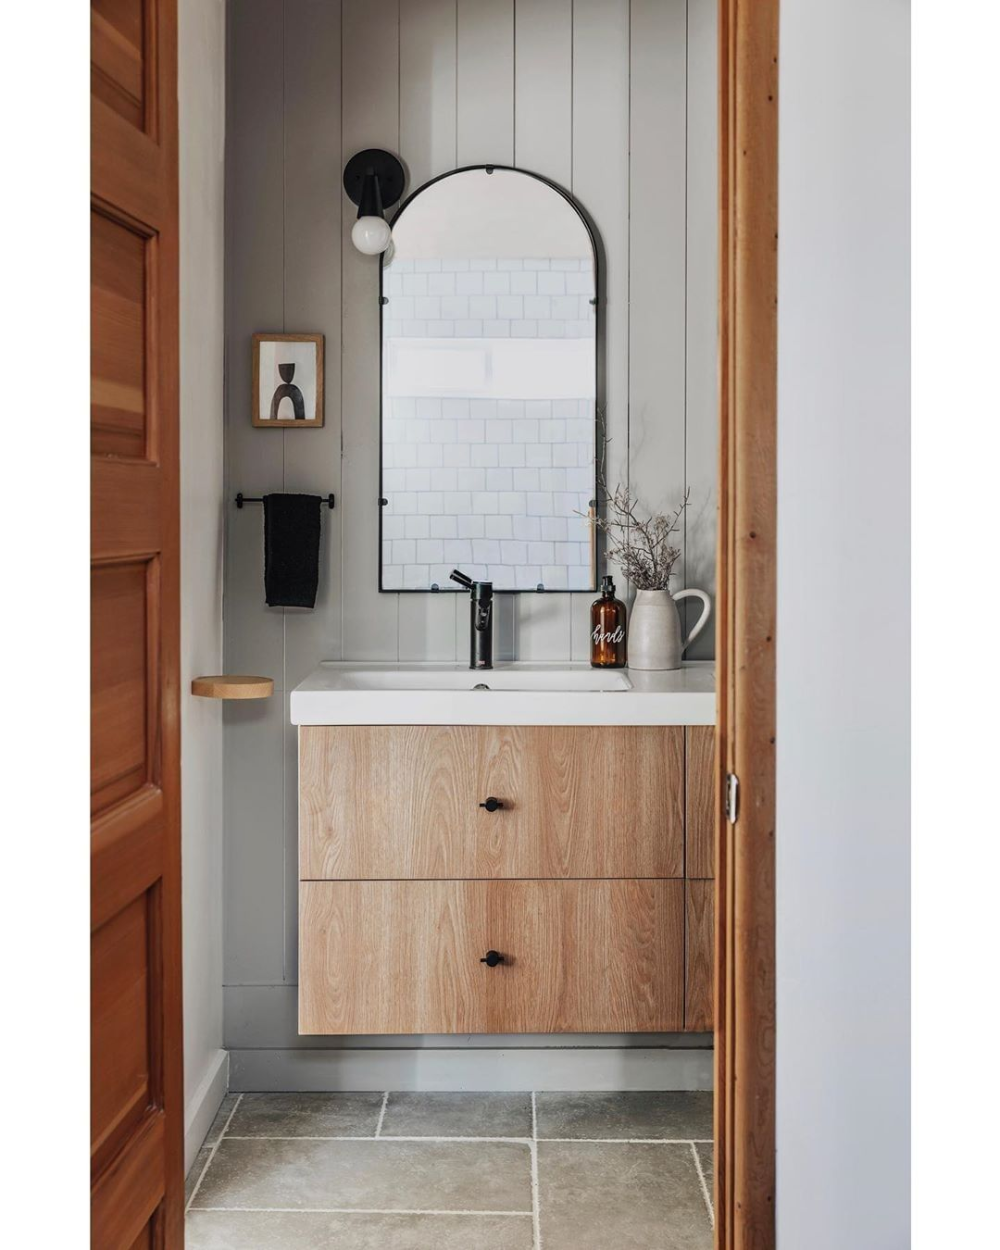 Doors for Ikea Kitchen, Bathroom, Closet, Media